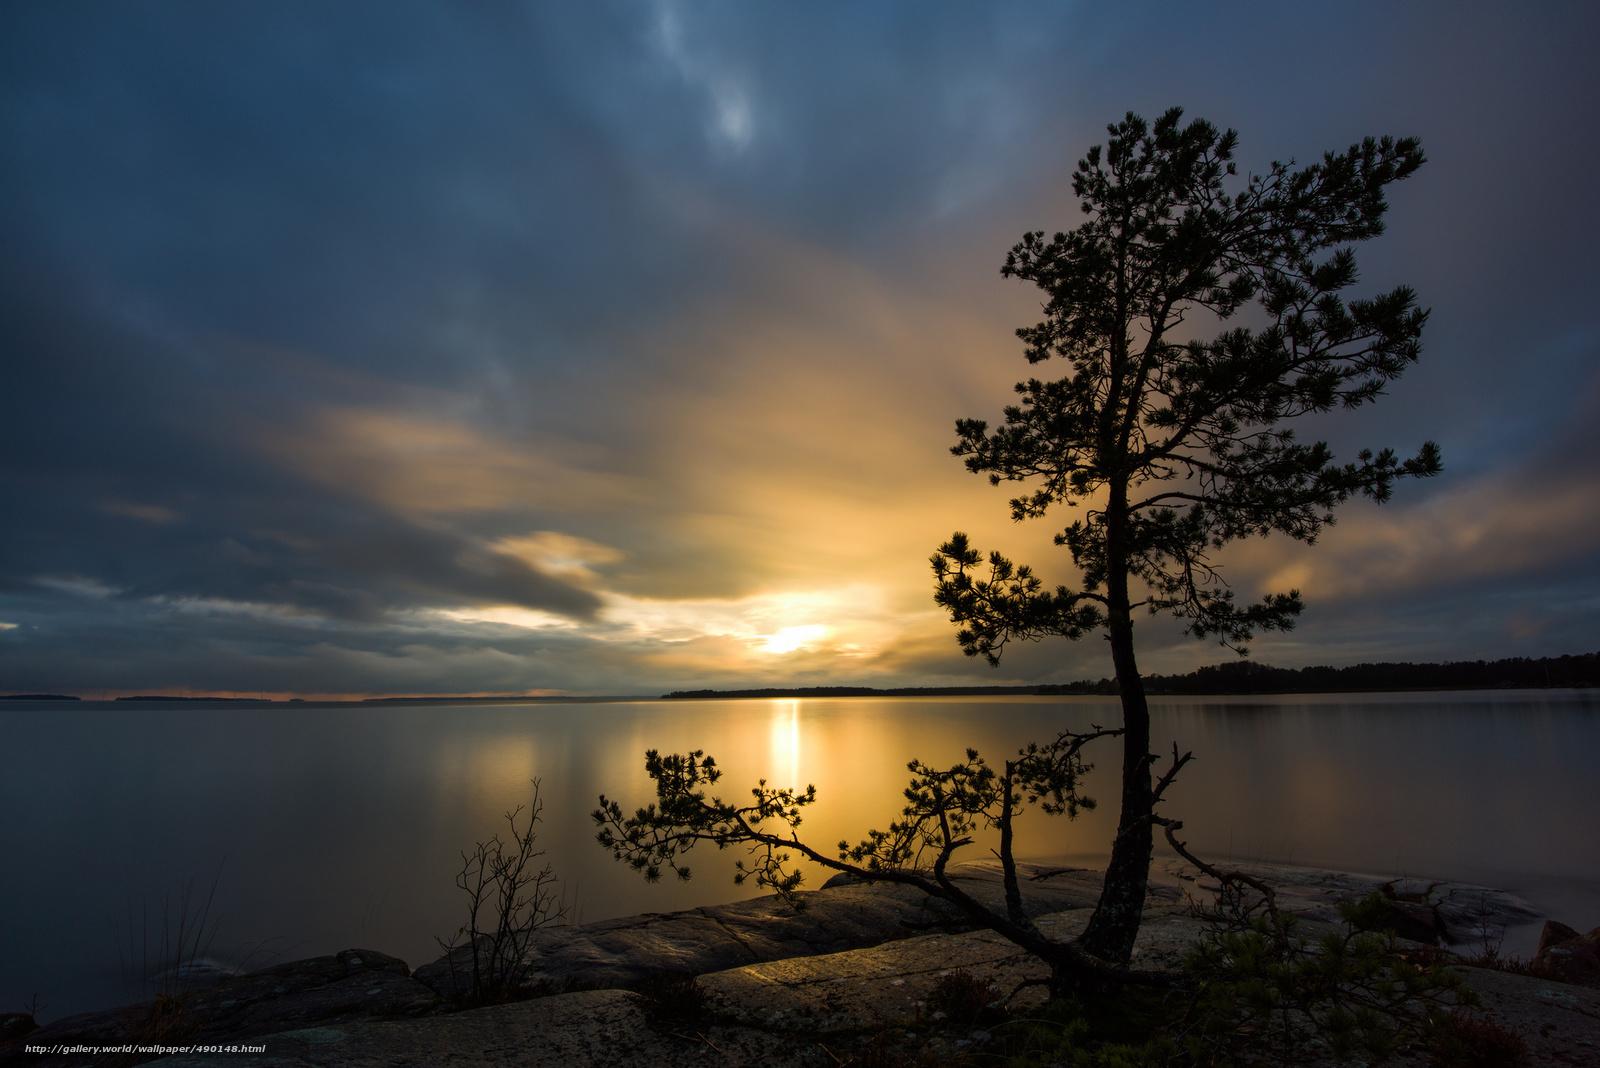 Download wallpaper sweden sweden lake sunset free - Wallpaper picture ...